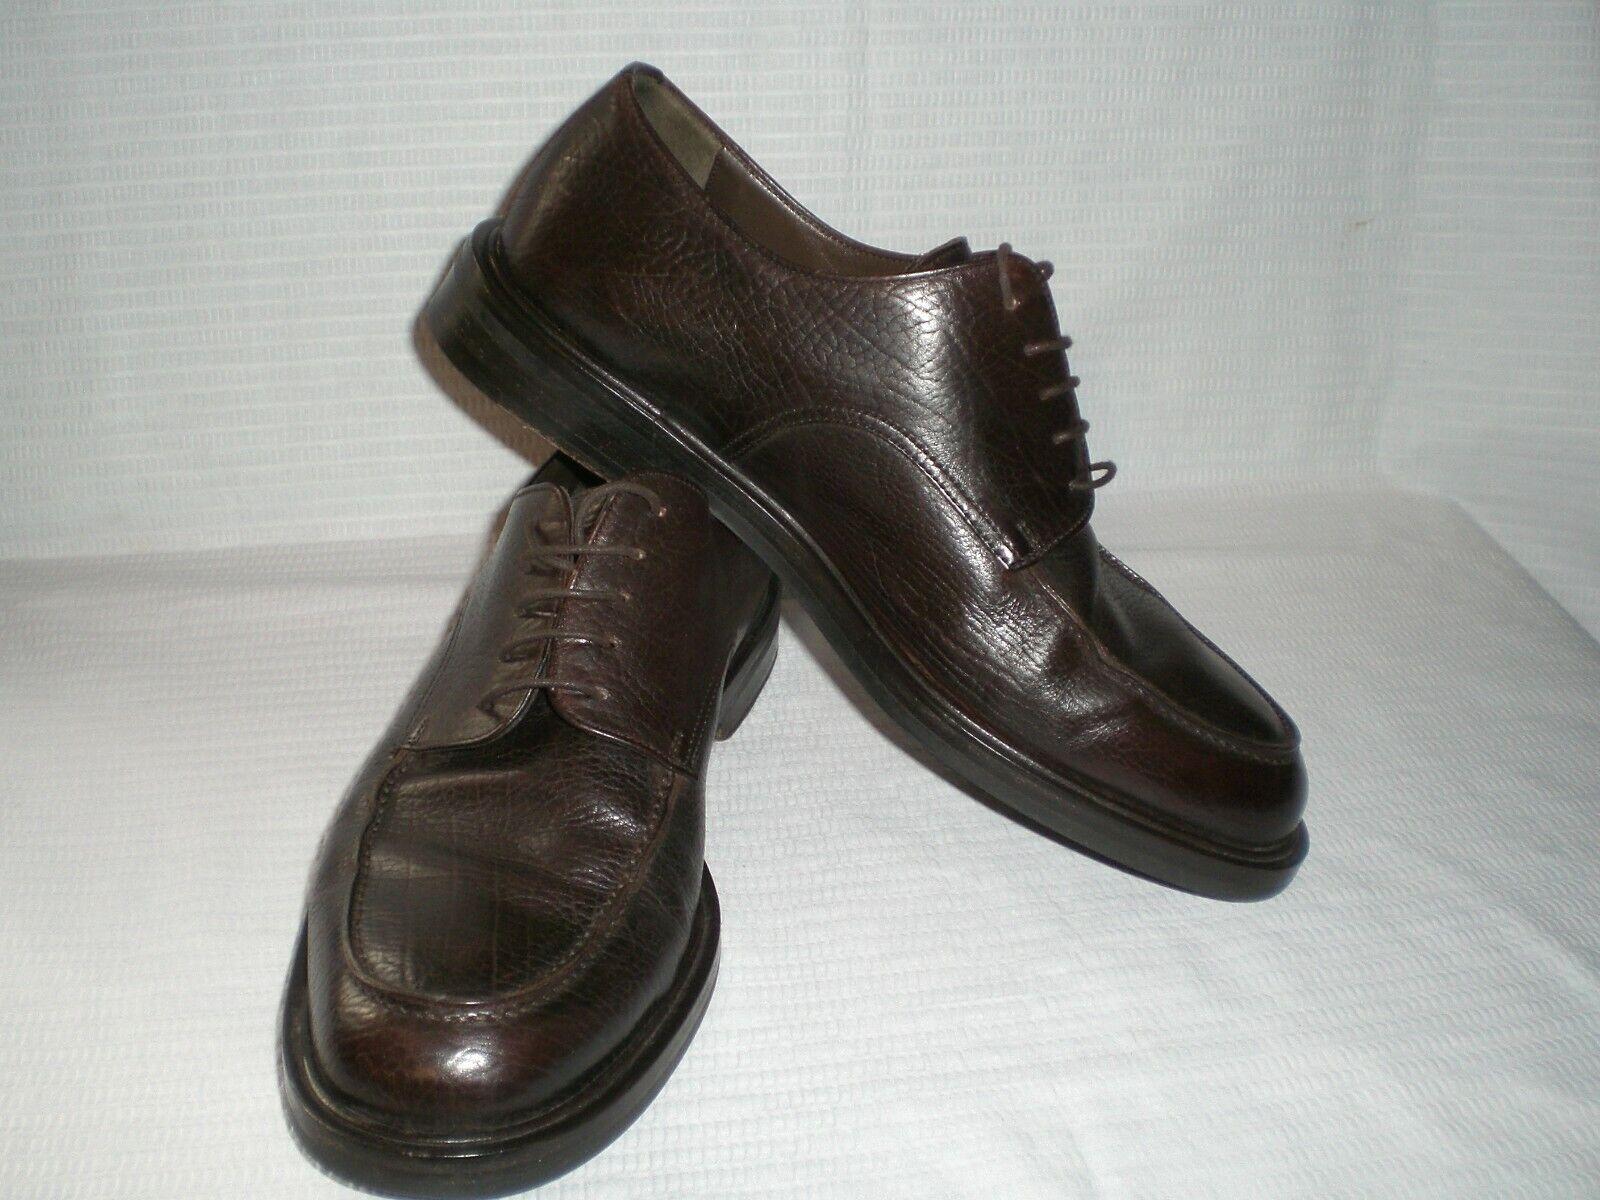 Cole Haan Dress Oxfords US 9.5D Brown Genuine Pebble Leather  Men's shoes